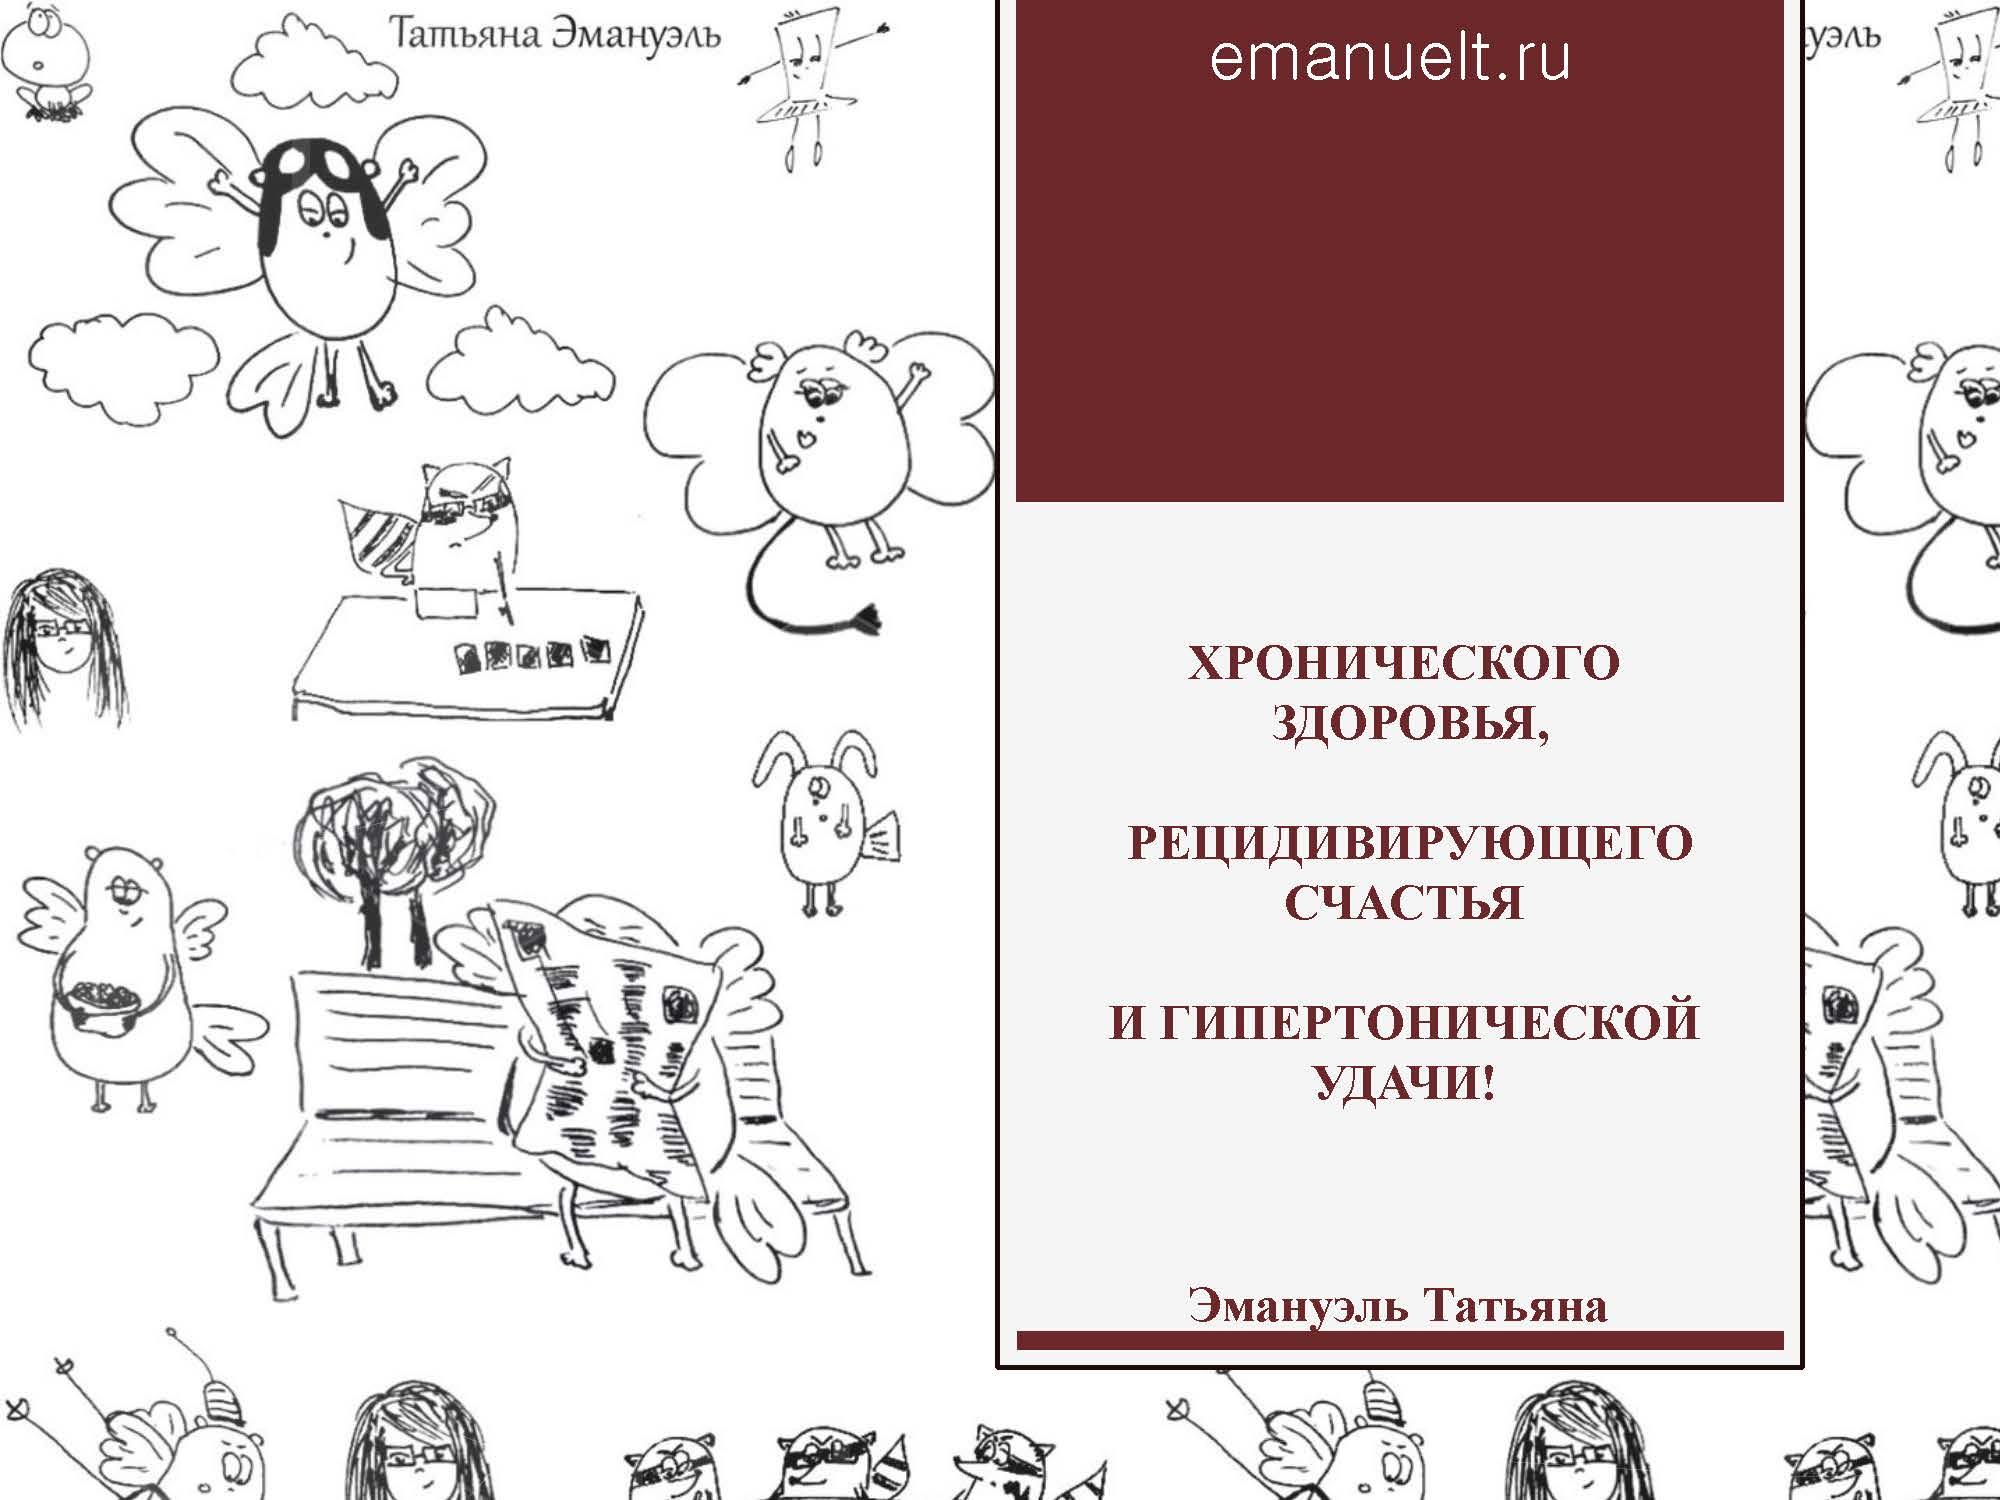 06 февраля эмануэль_Страница_122